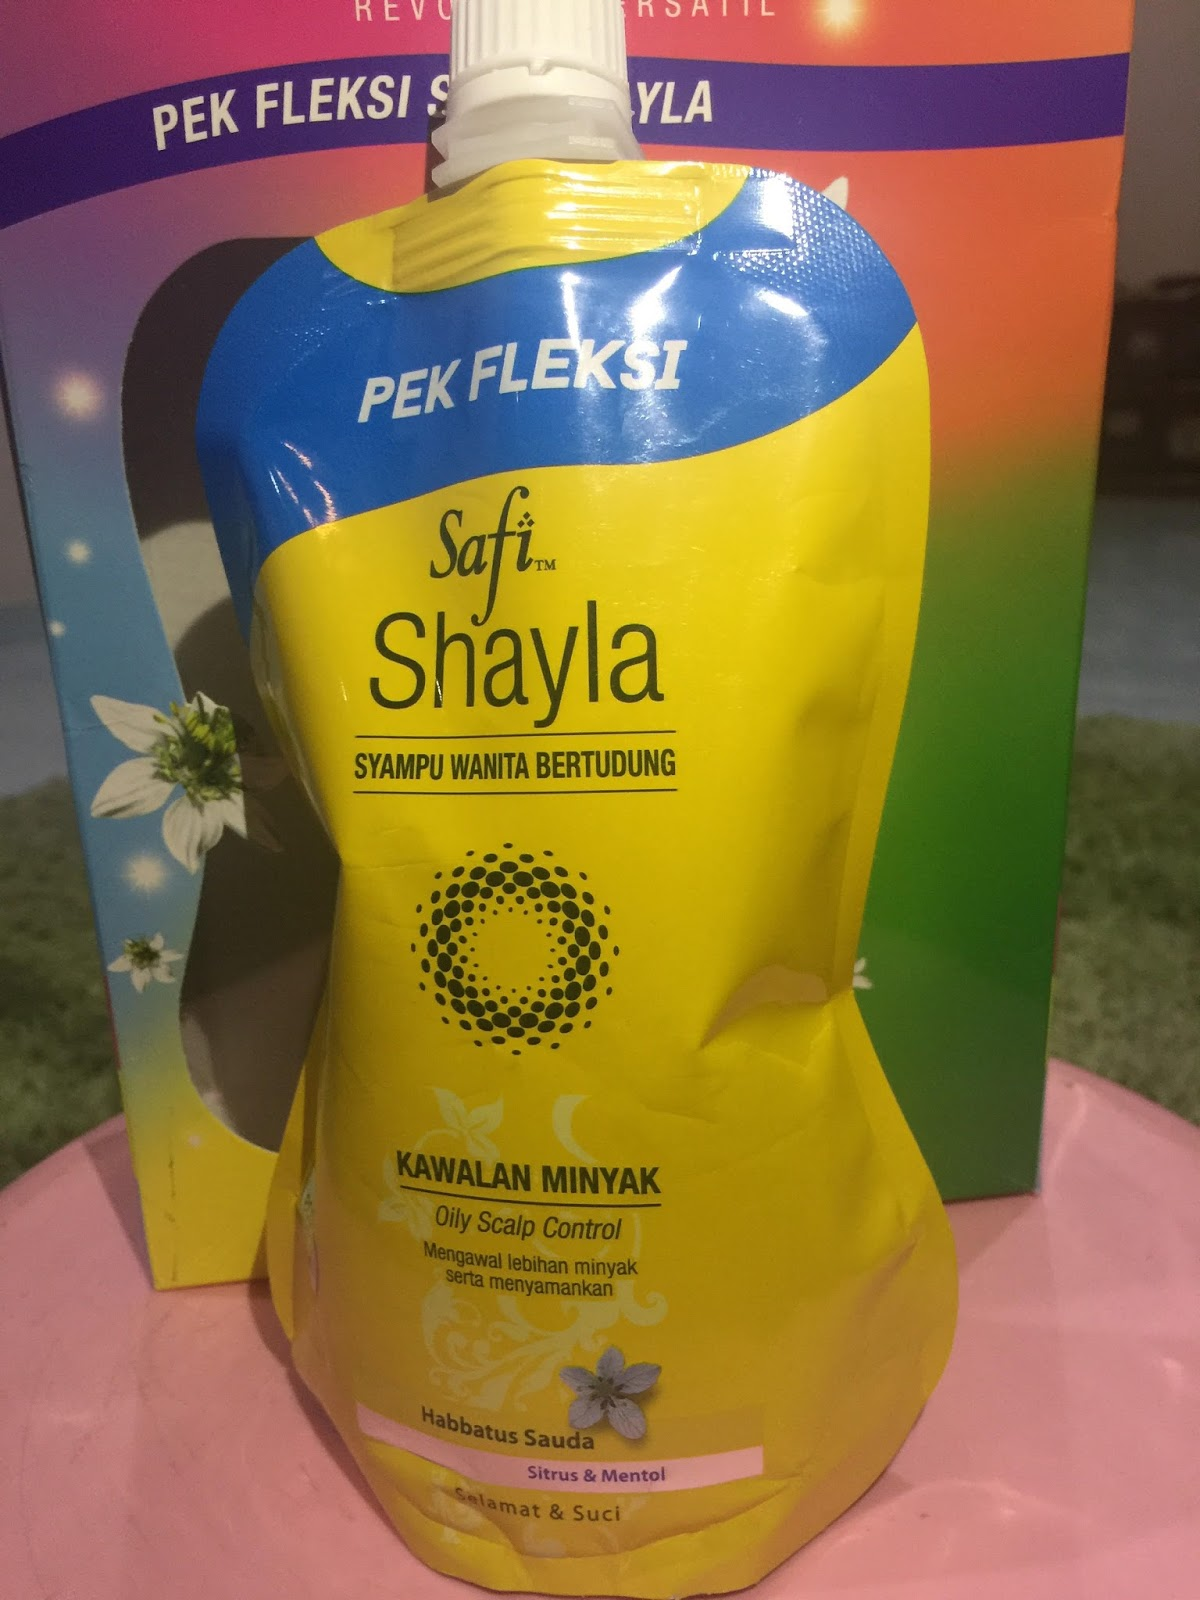 SAFI Shayla Pek Fleksi - Inovasi Syampu Terkini Wanita Bertudung